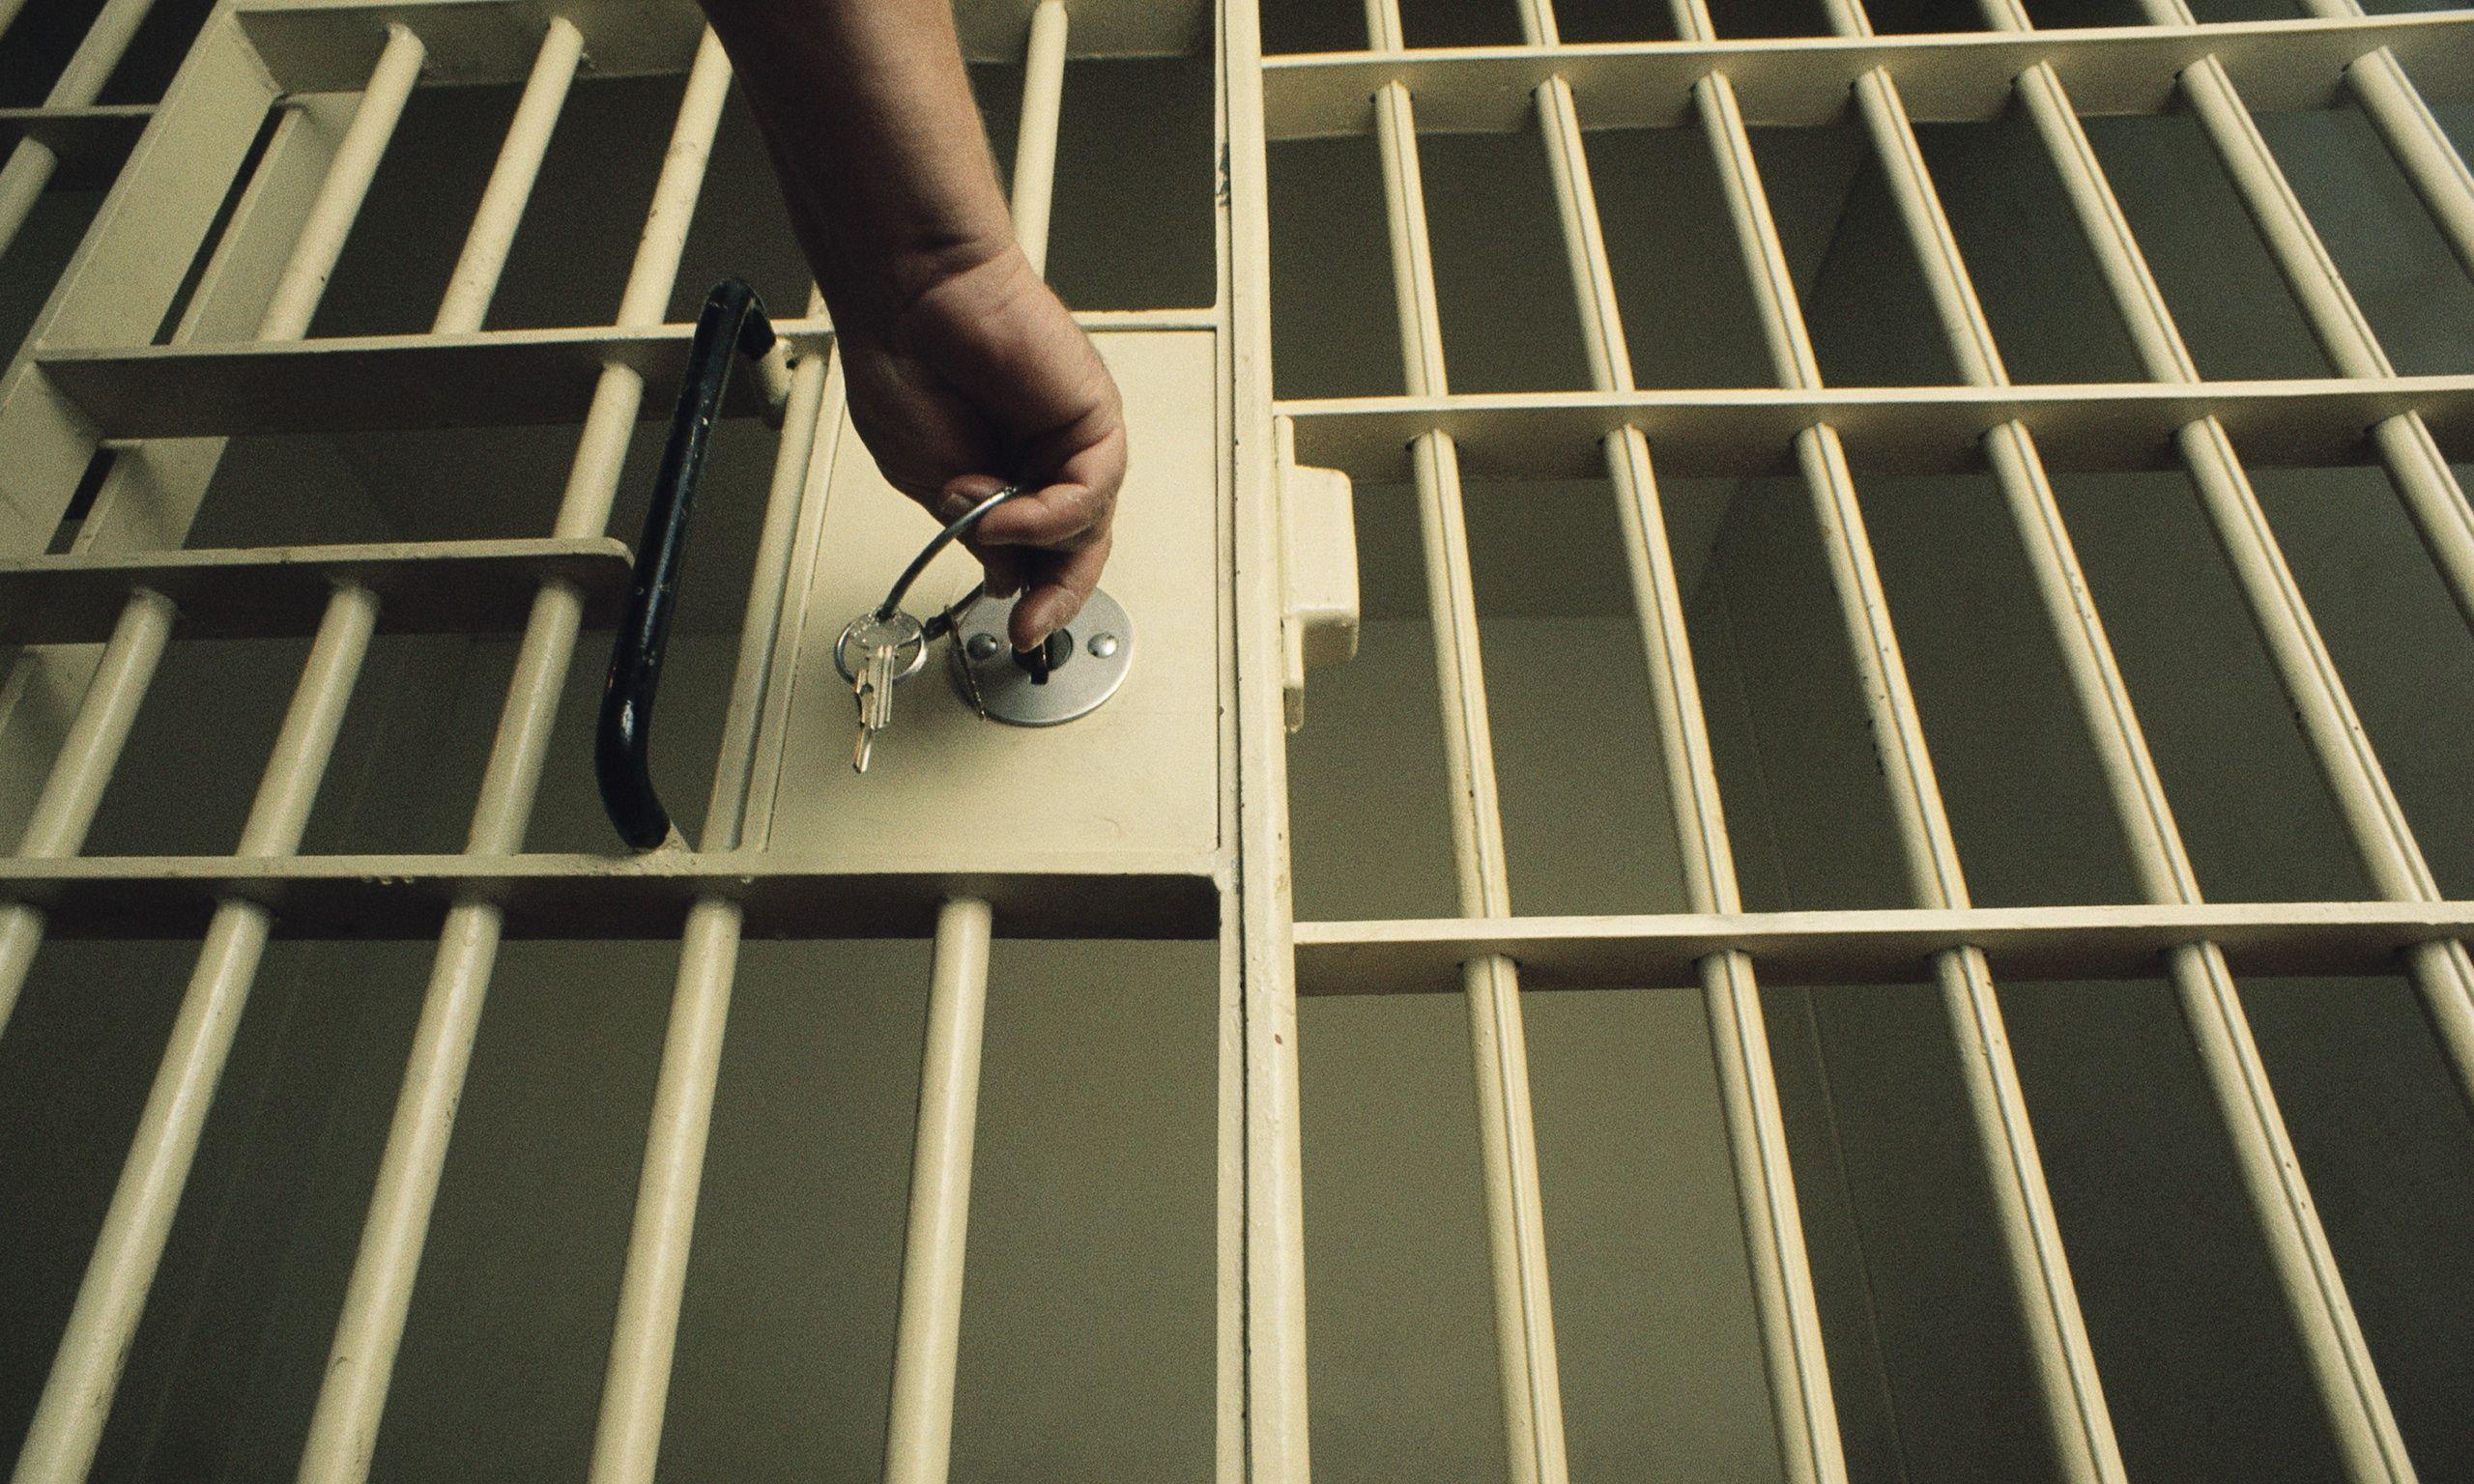 Милиция задержала пенсионерку, подозреваемую вубийстве матери